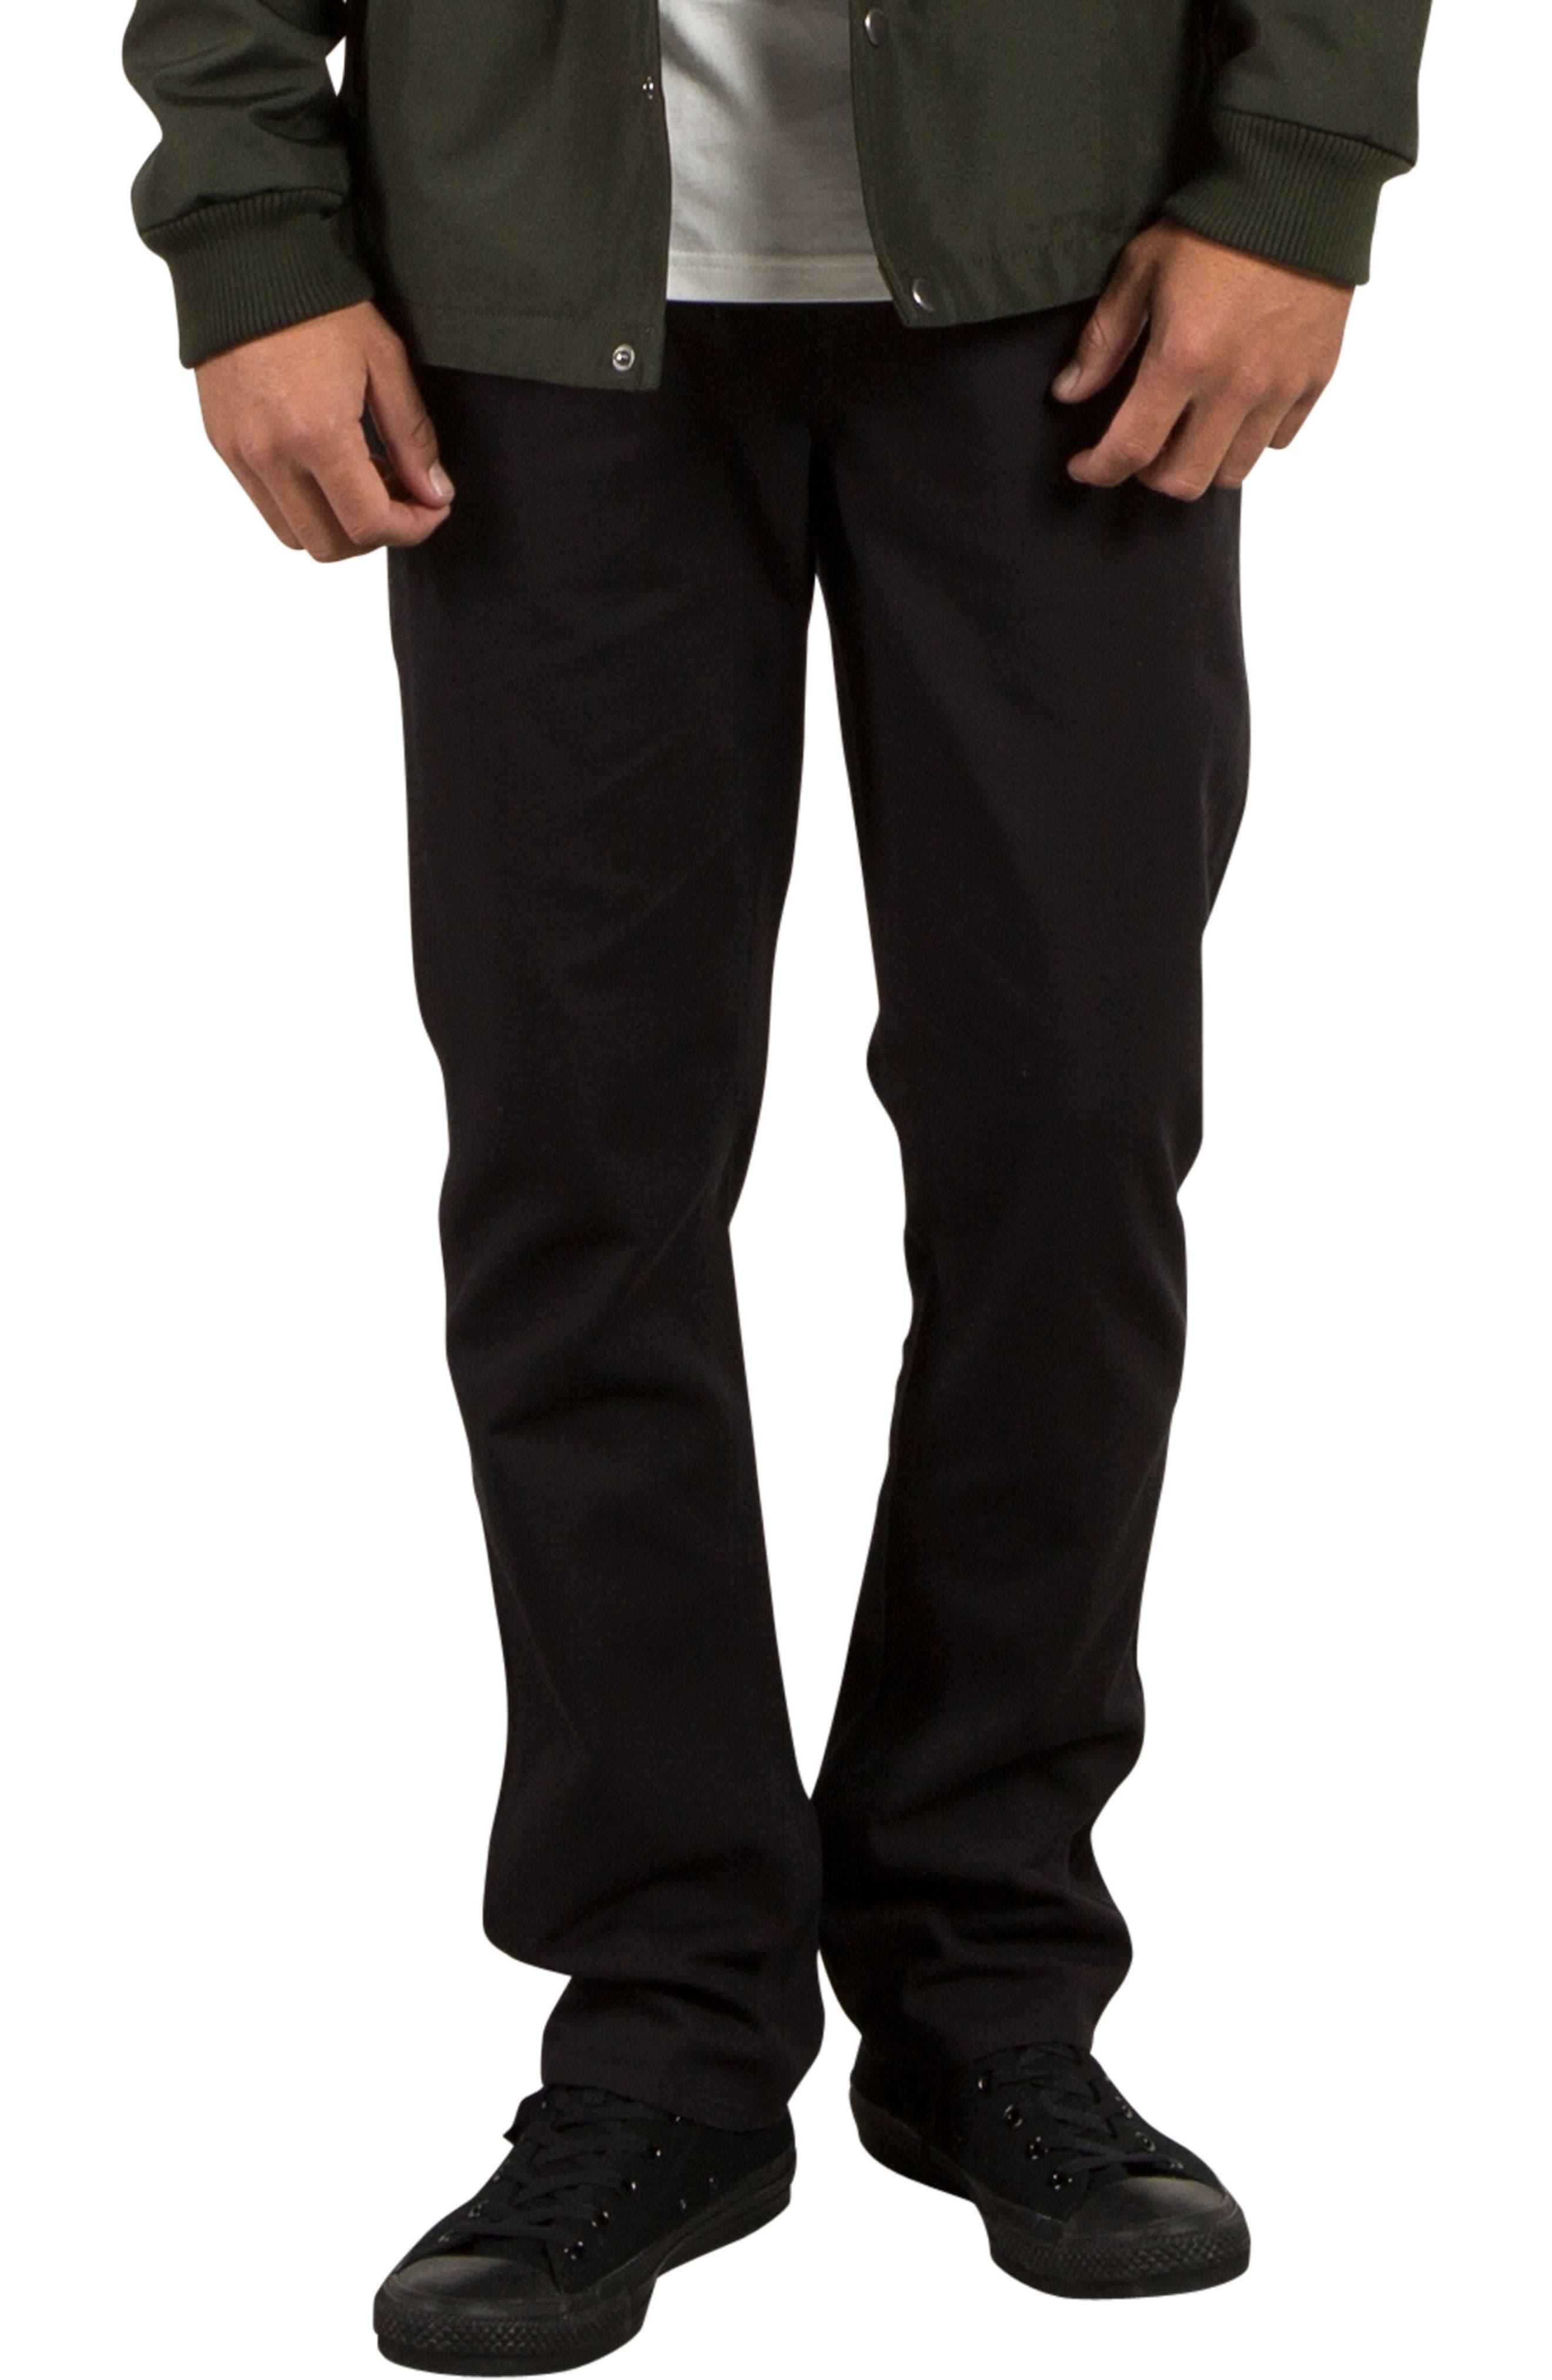 VSM Gritter Slim Chinos,                         Main,                         color, Black